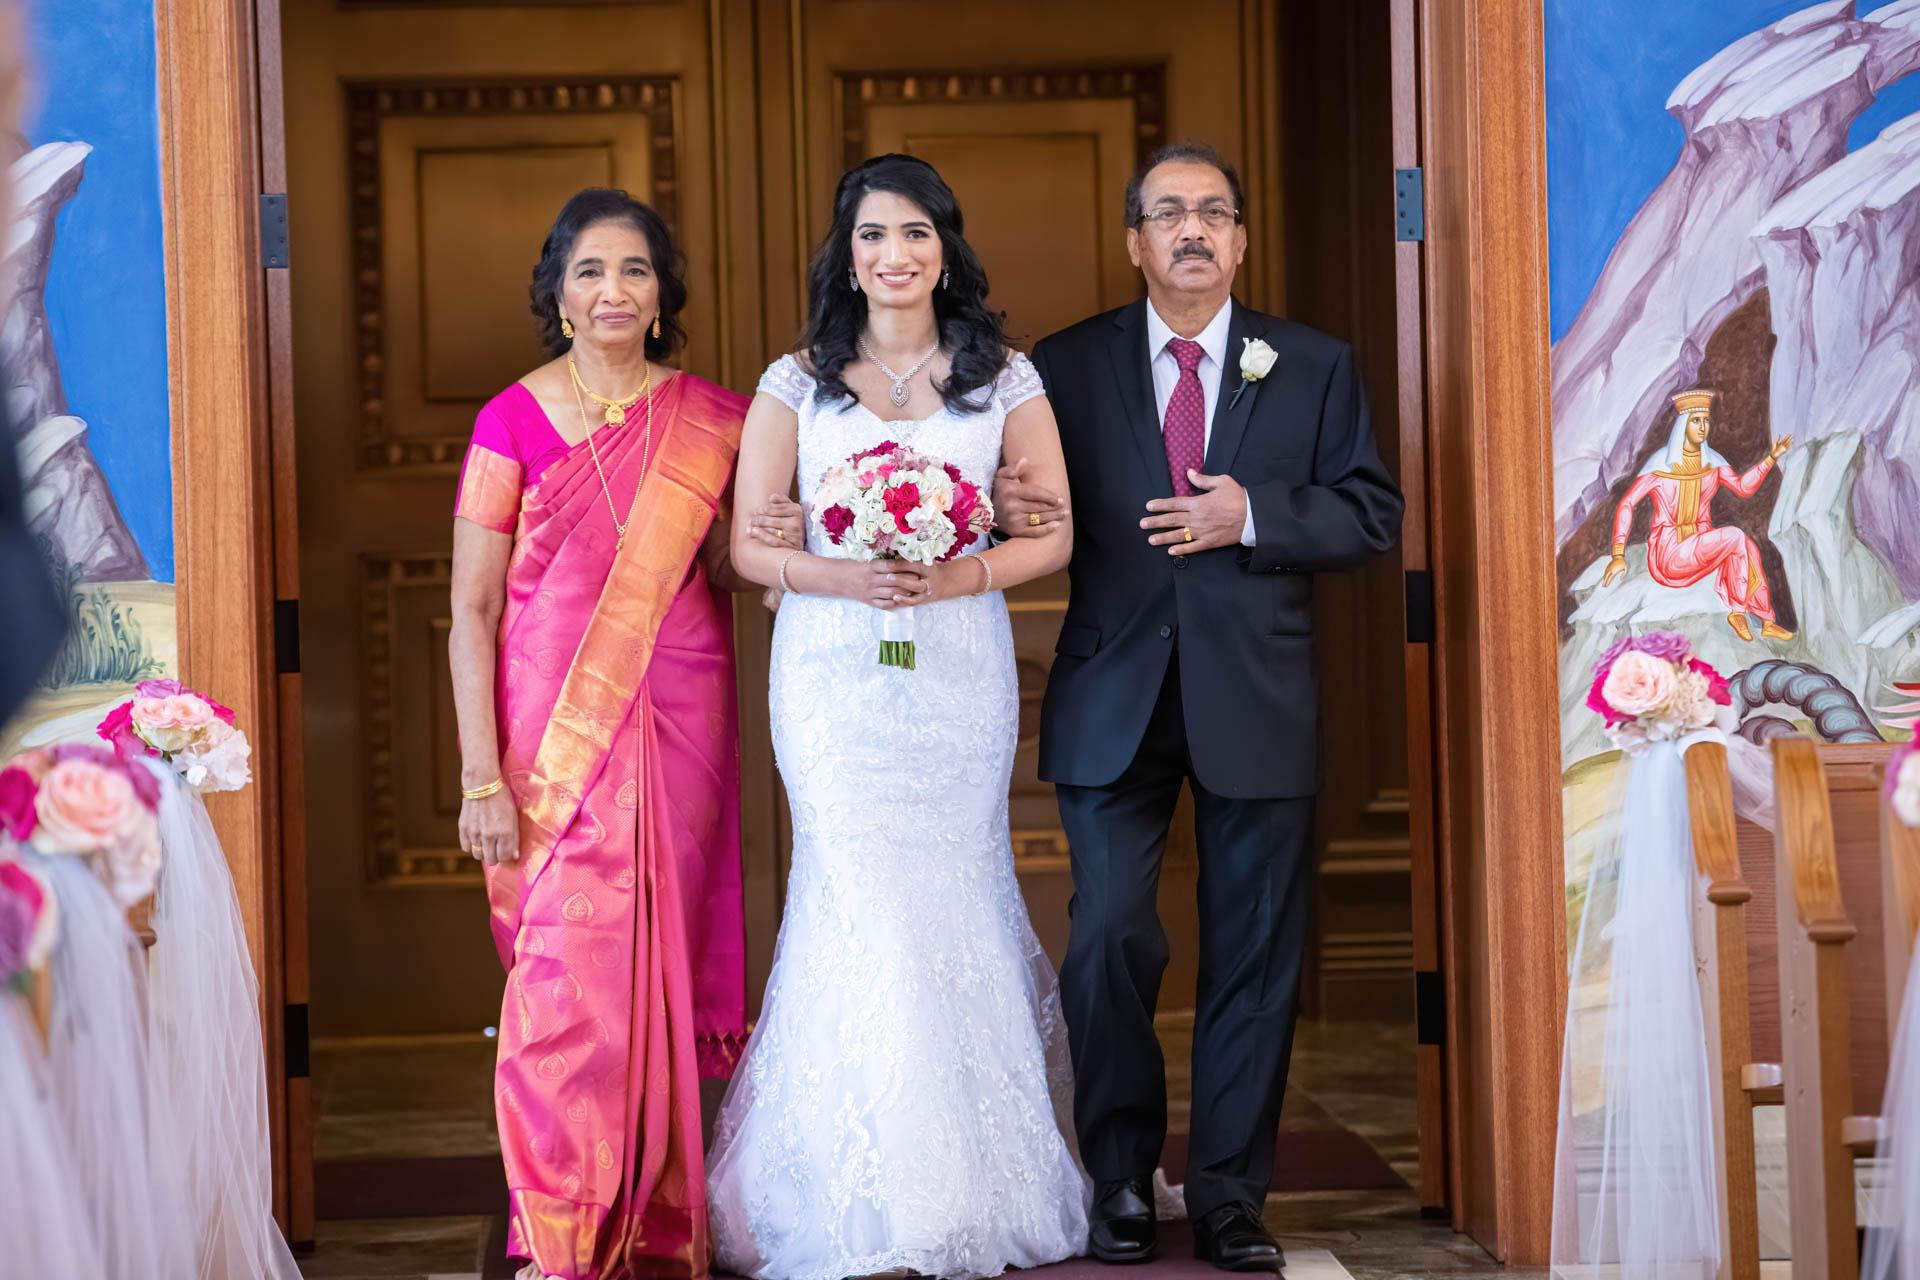 WESTMOUNT COUNTRY CLUB INDIAN WEDDING 8